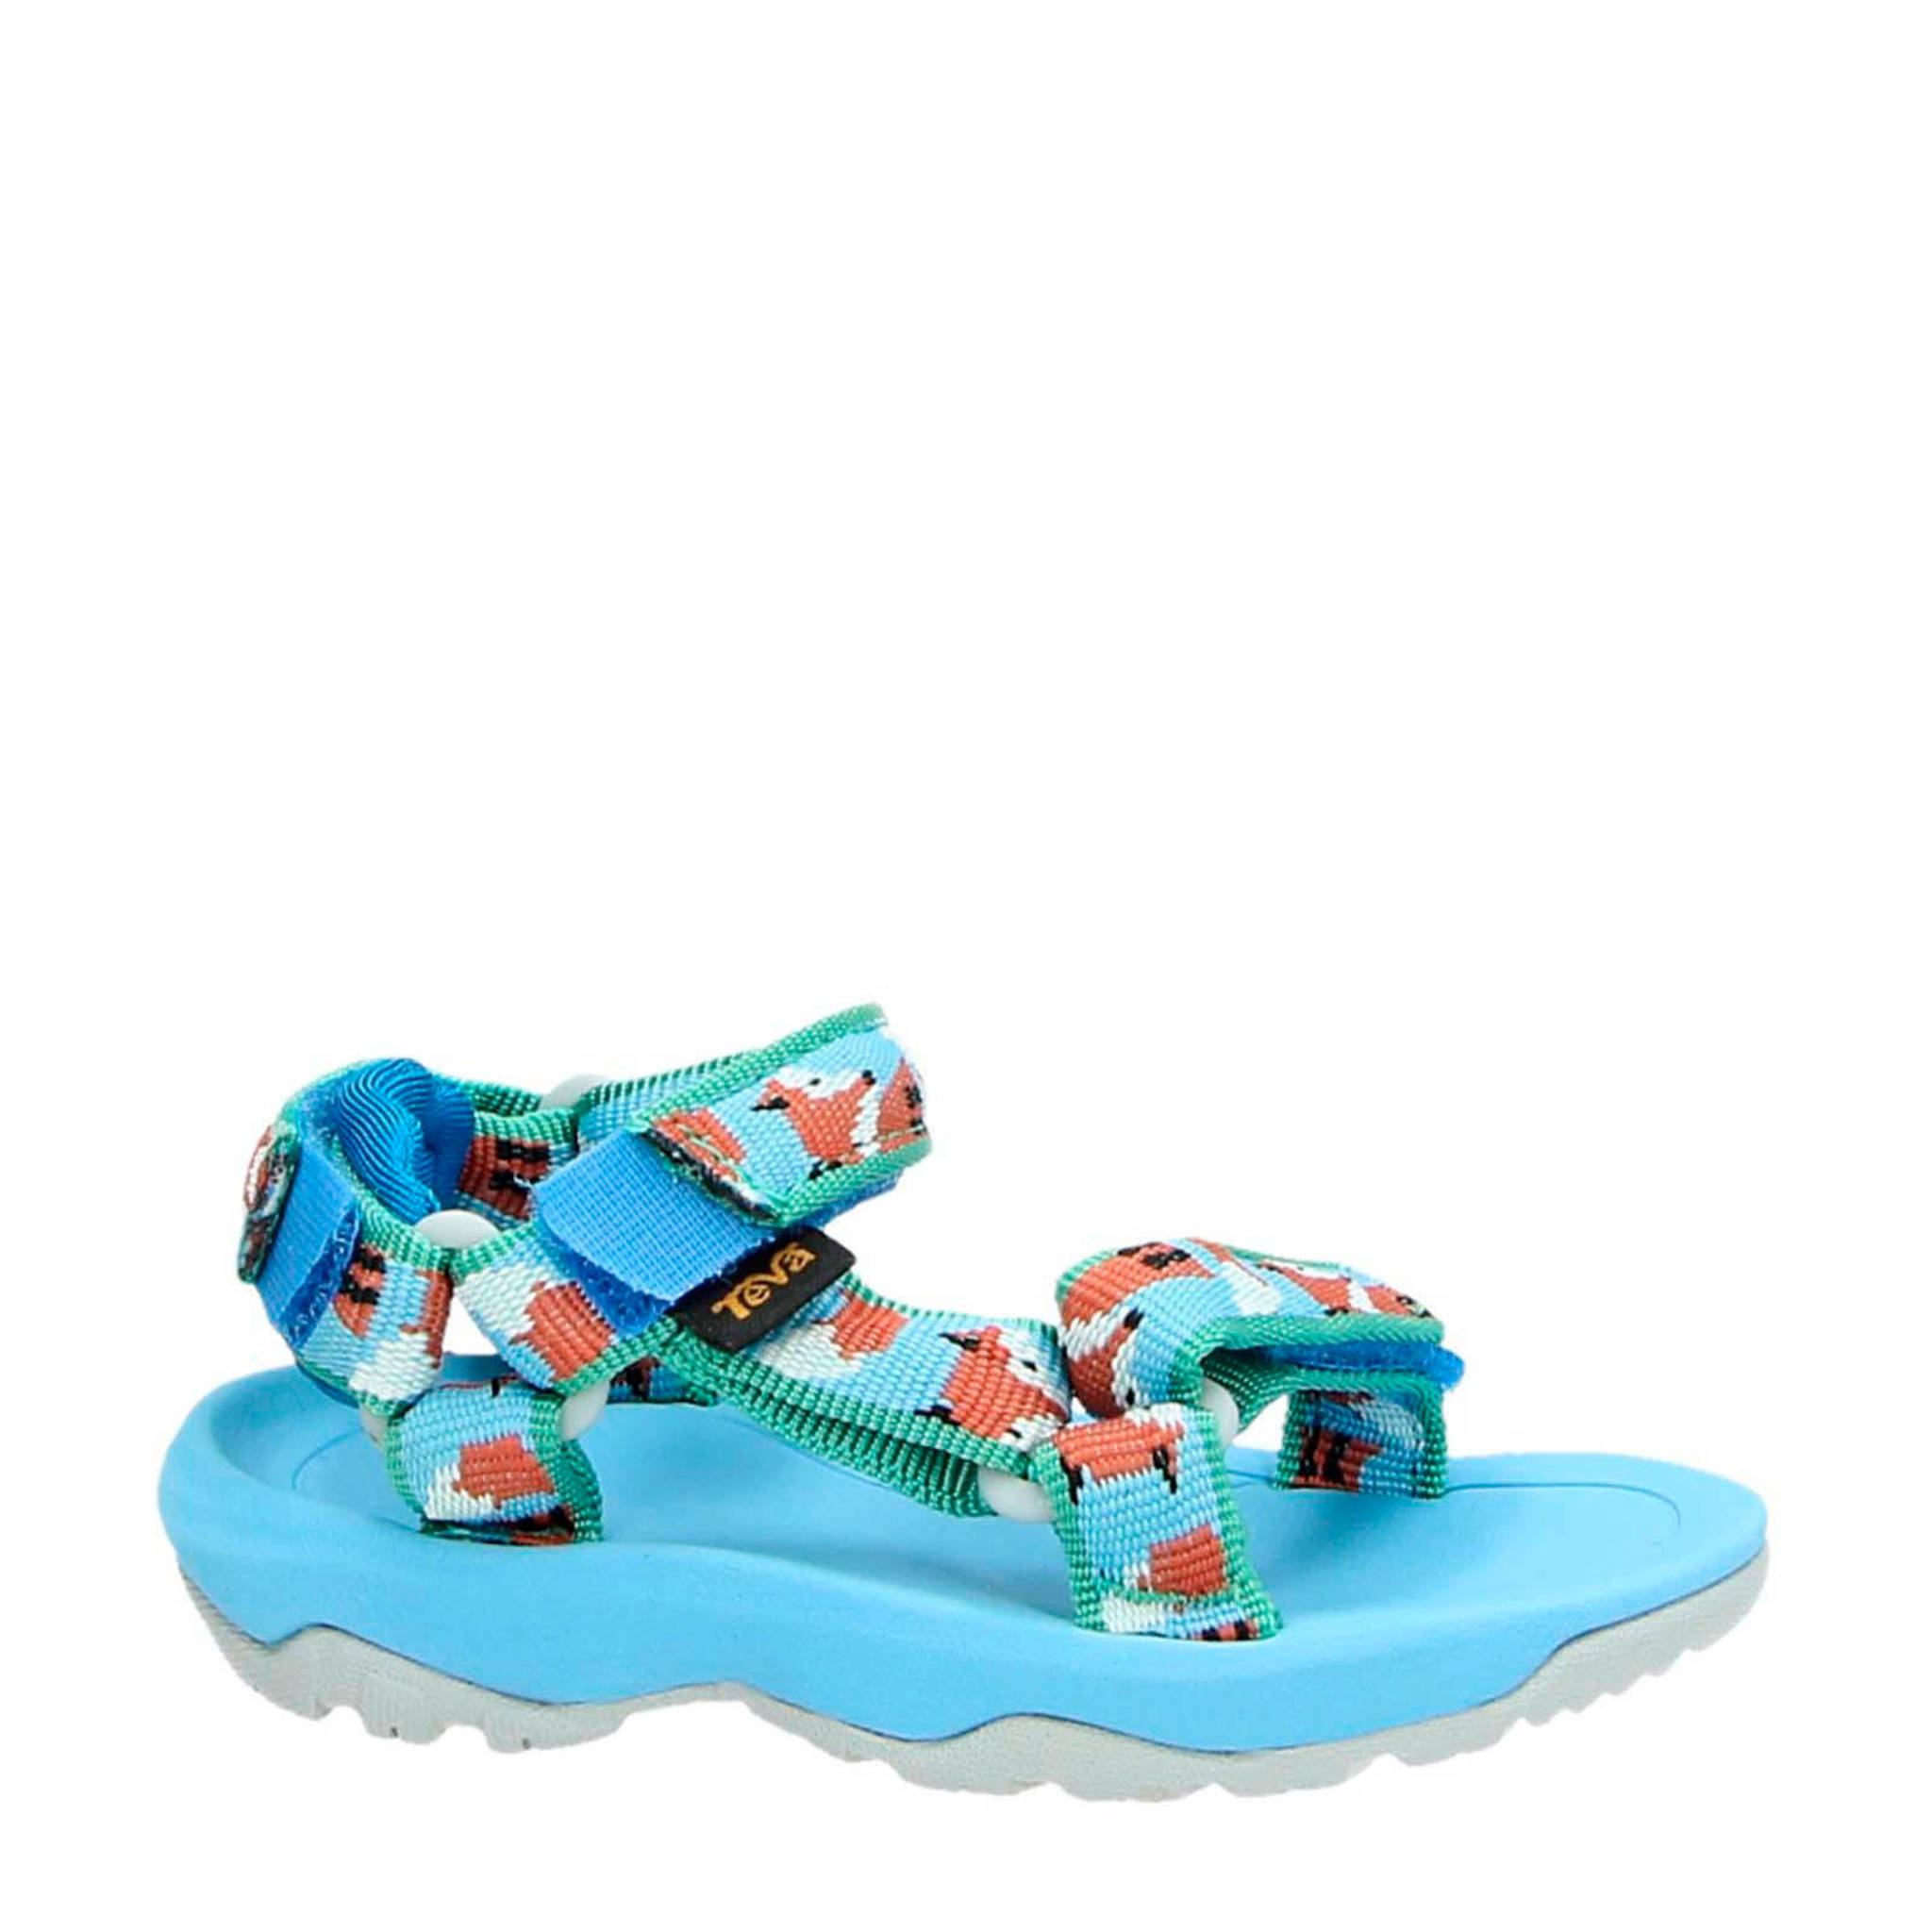 3e7f7df96bdd Teva Hurricane XLT 2 outdoor sandalen blauw